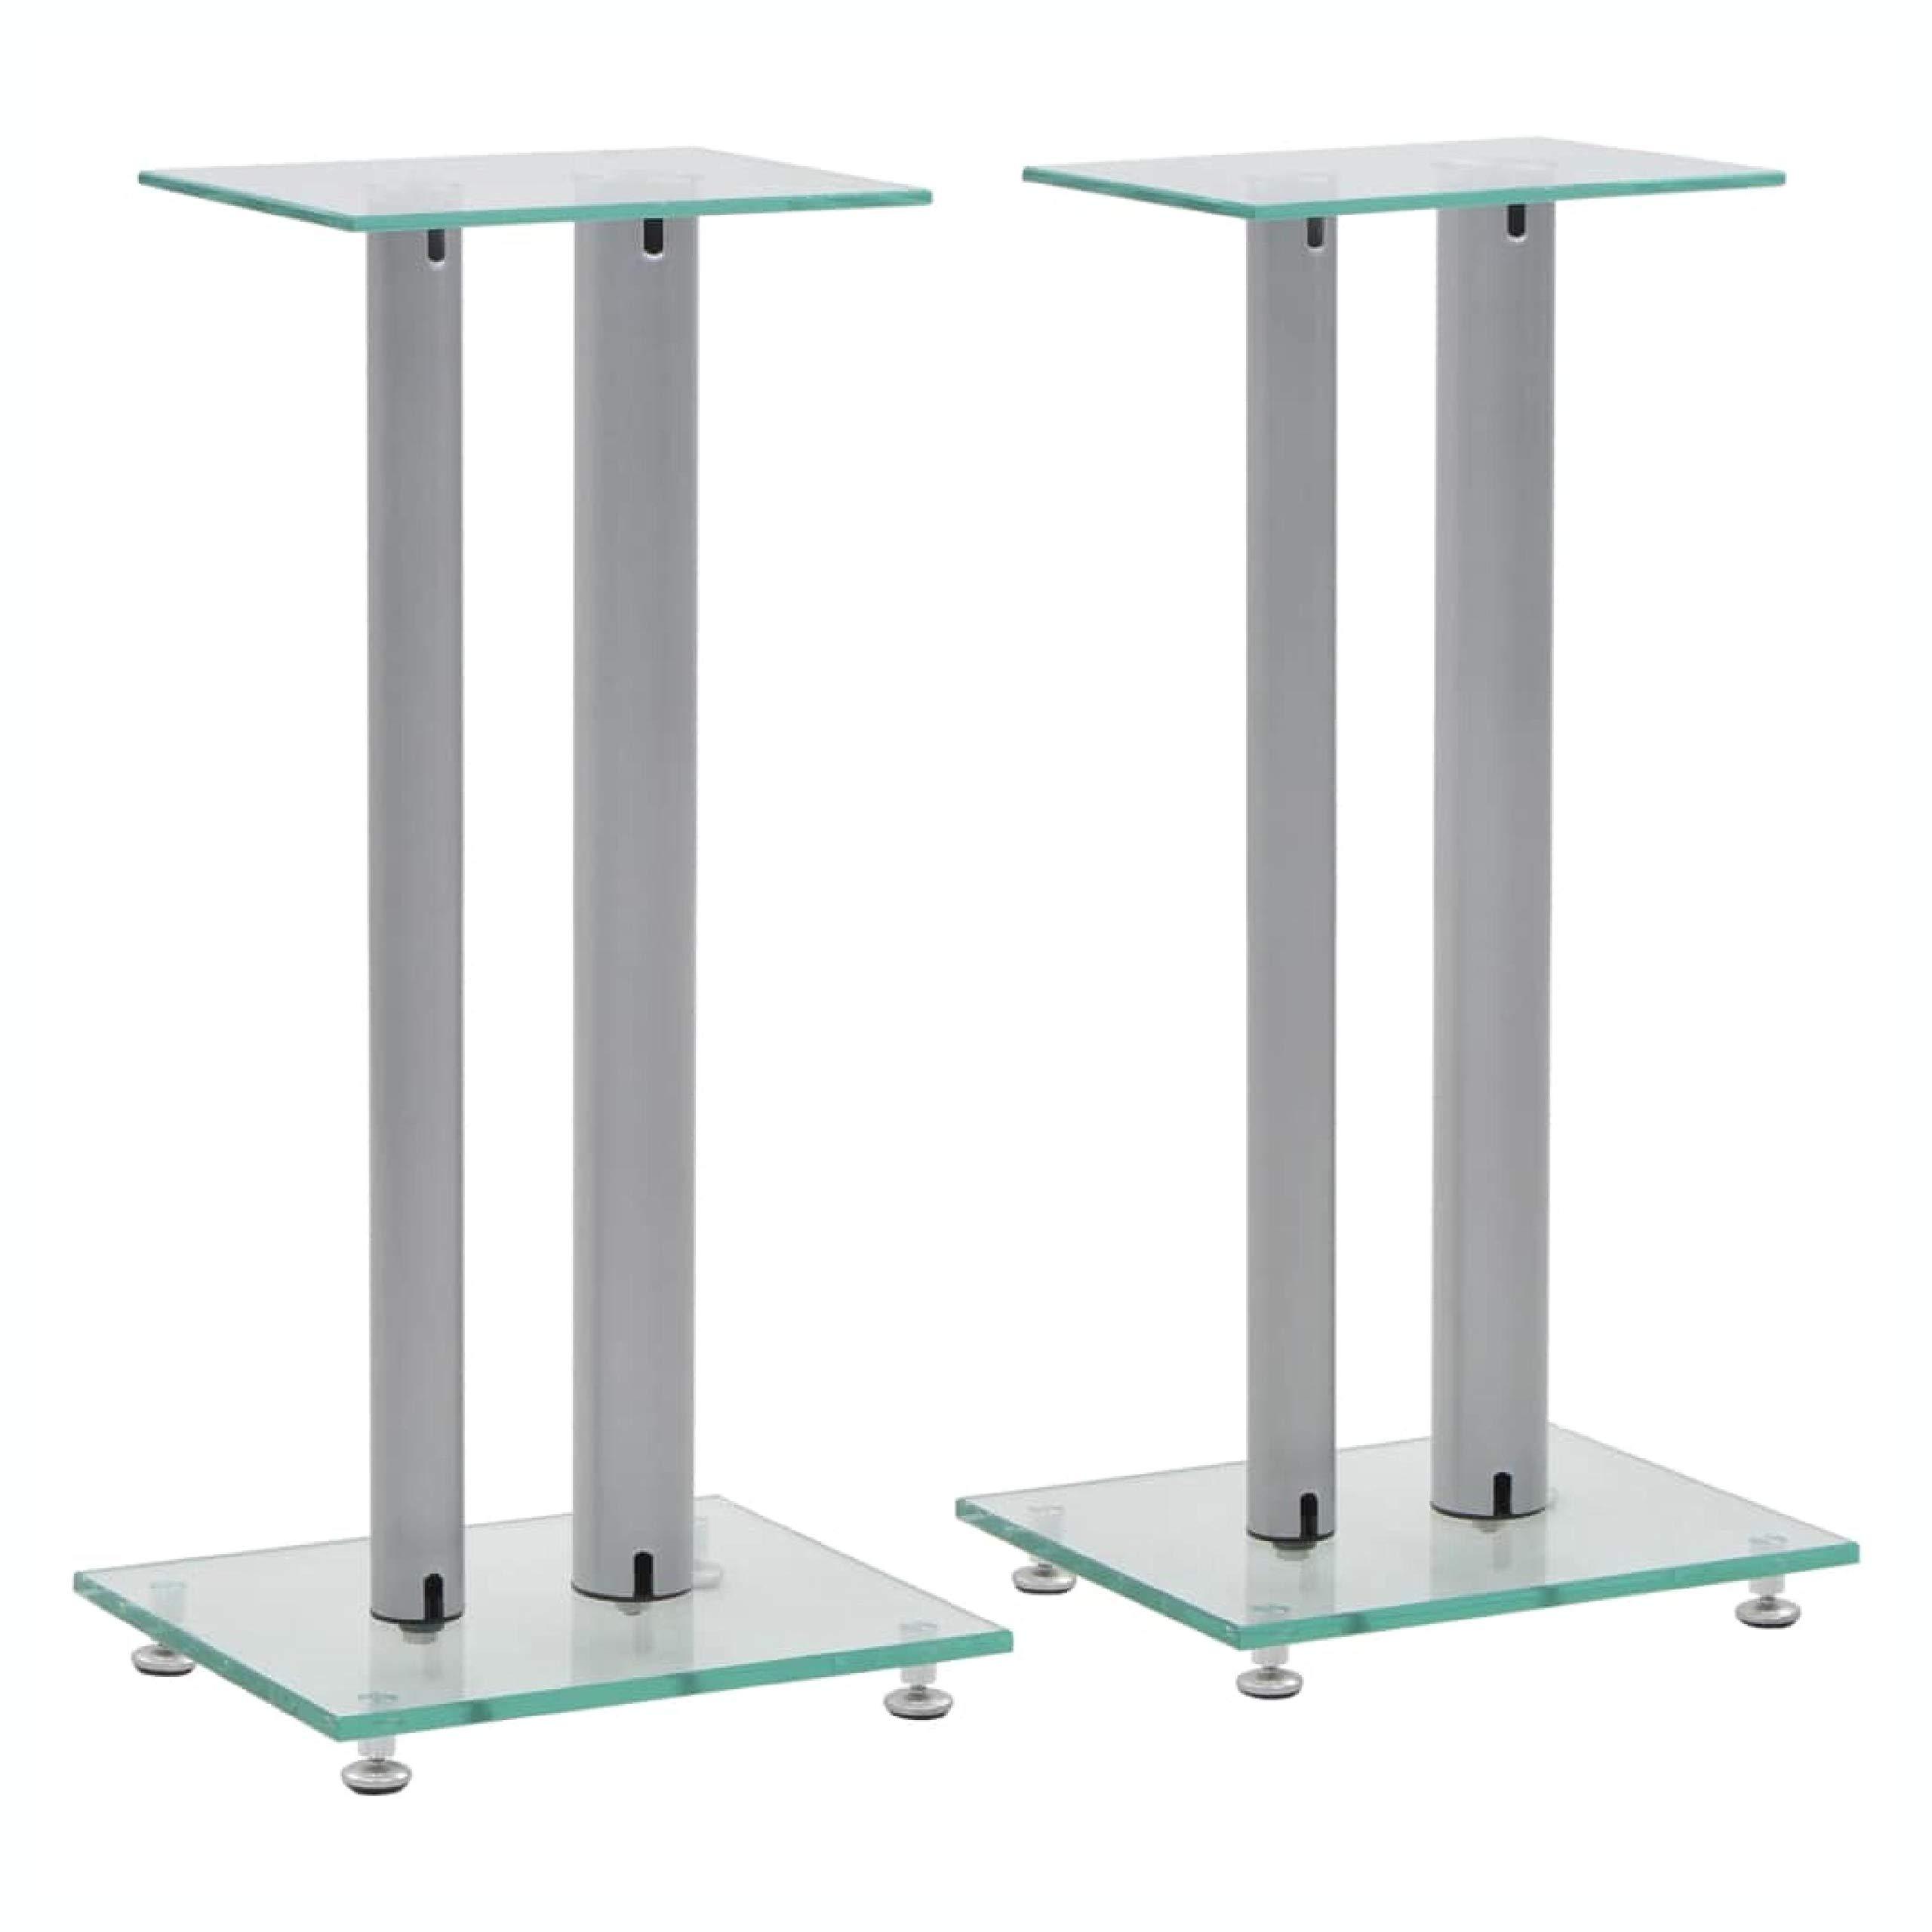 HomyDelight Speaker Stand & Mount, Speaker Stands 2 pcs Tempered Glass 2 Pillars Design Silver by HomyDelight